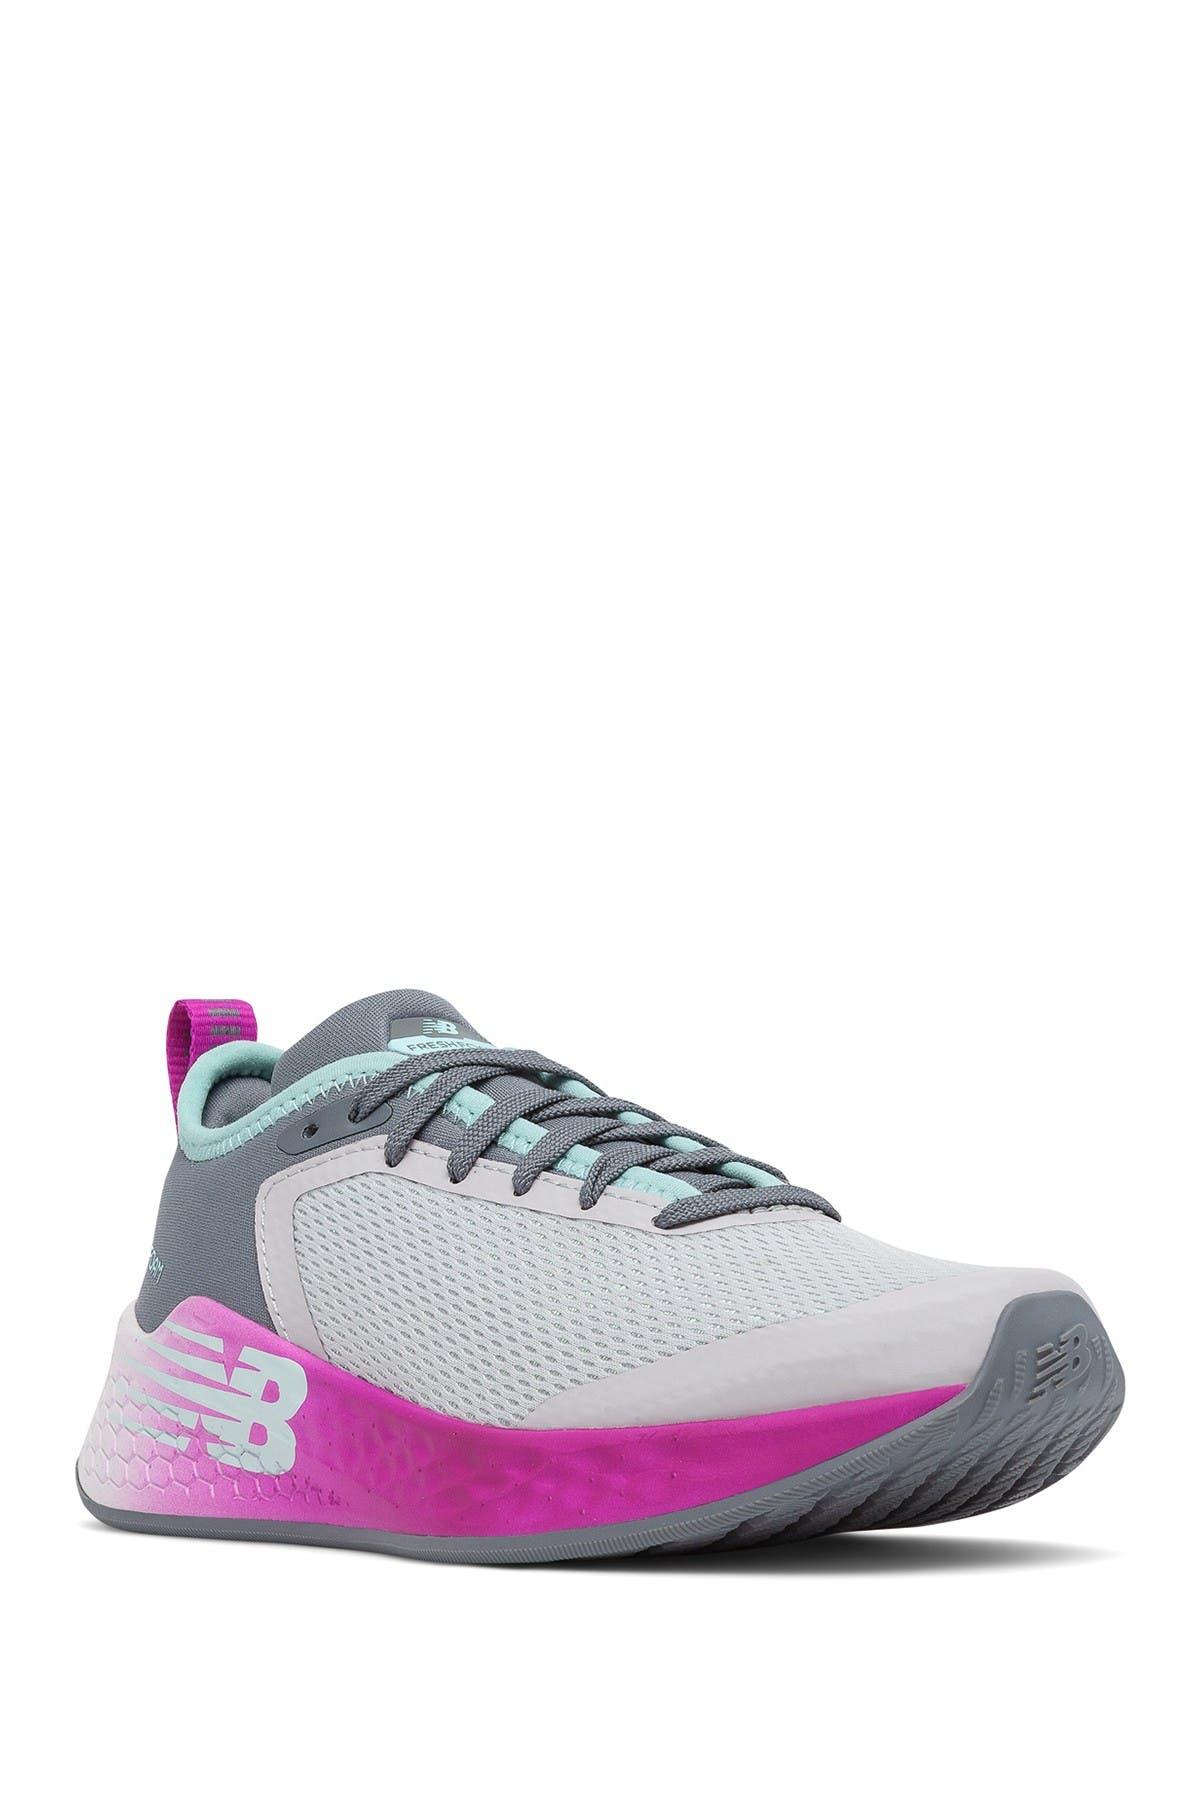 Image of New Balance Fresh Foam Fast V2 Running Shoe